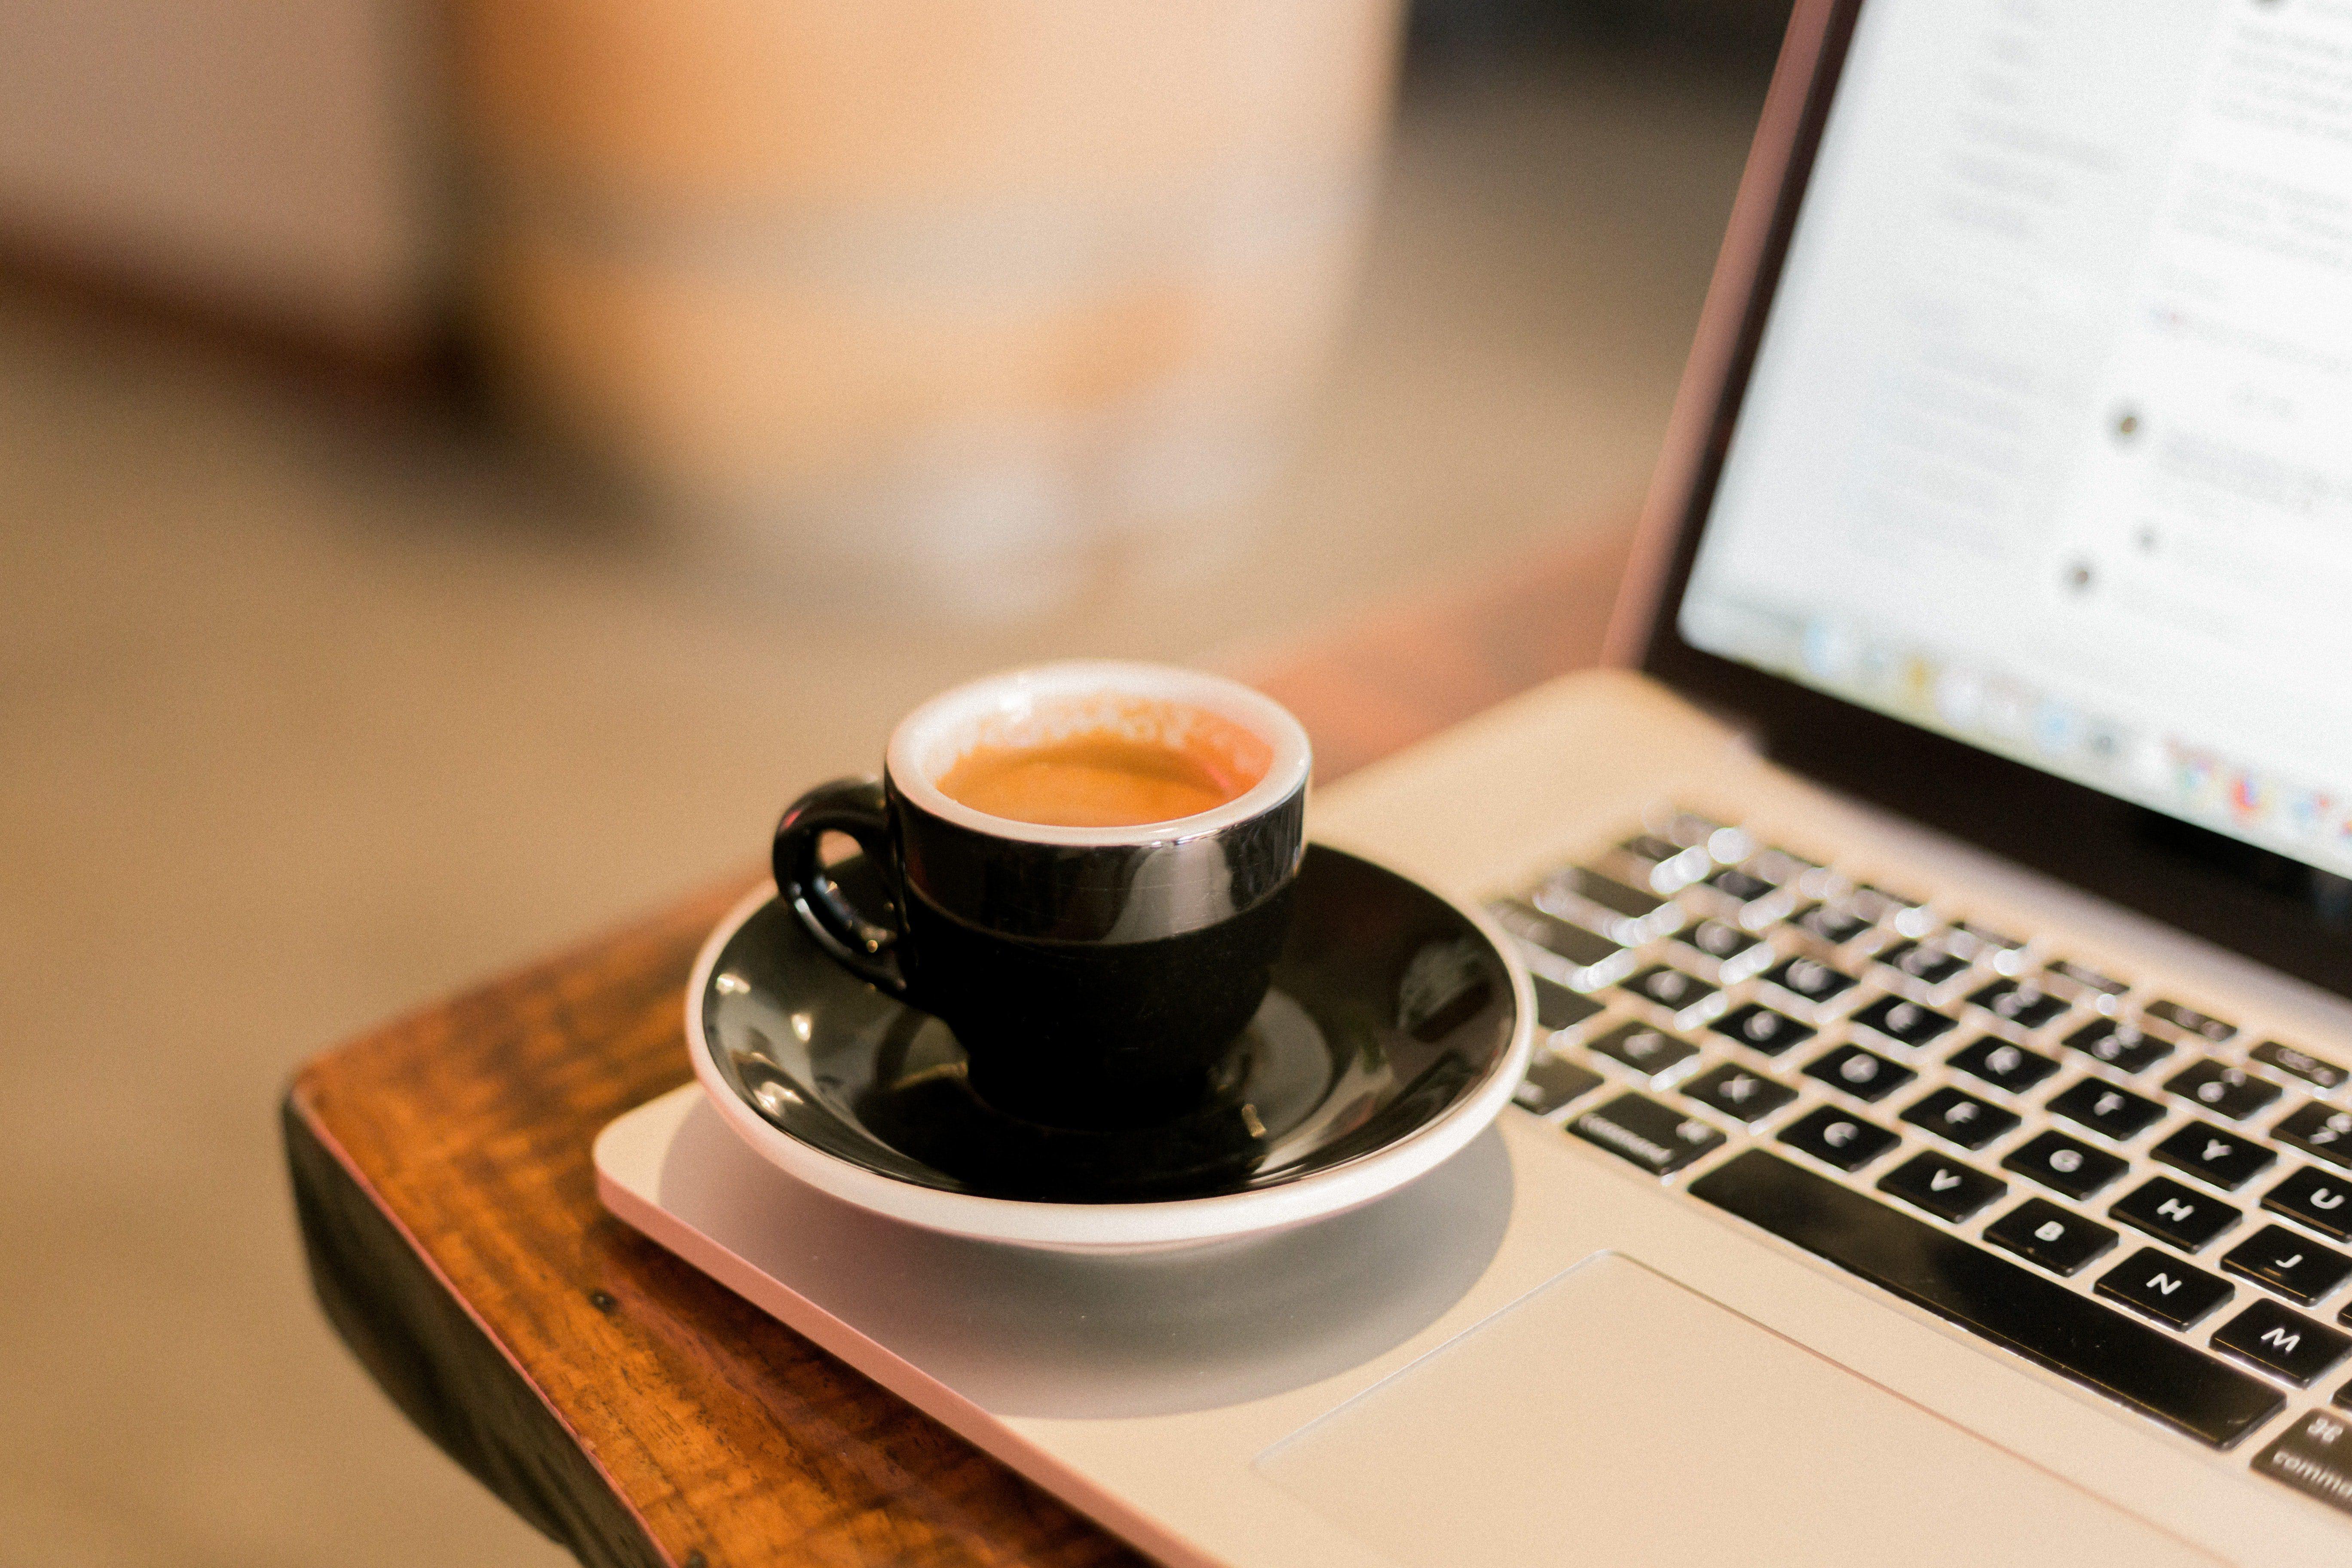 Coffee and Wikipedia